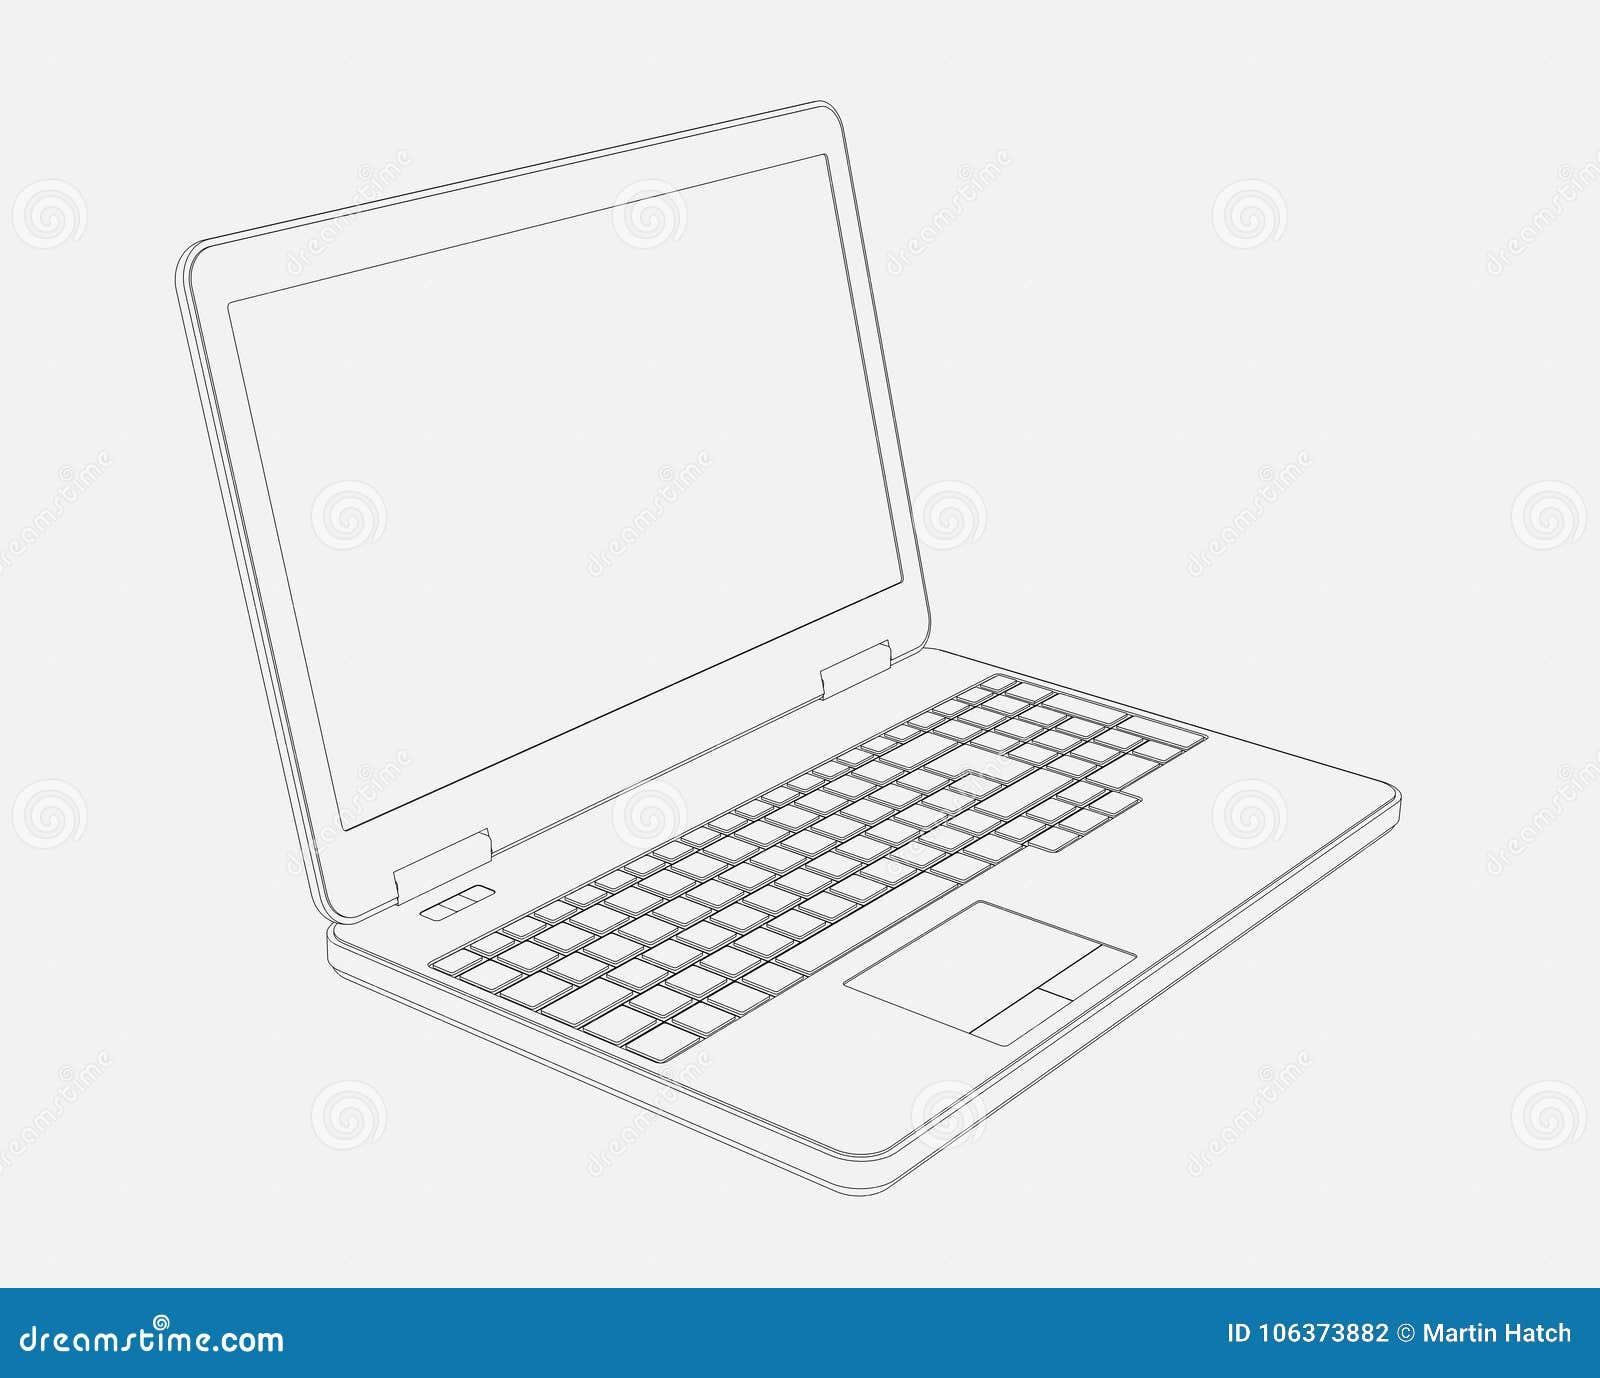 Dibujo 3d Del Ordenador Portatil Stock De Ilustracion Ilustracion